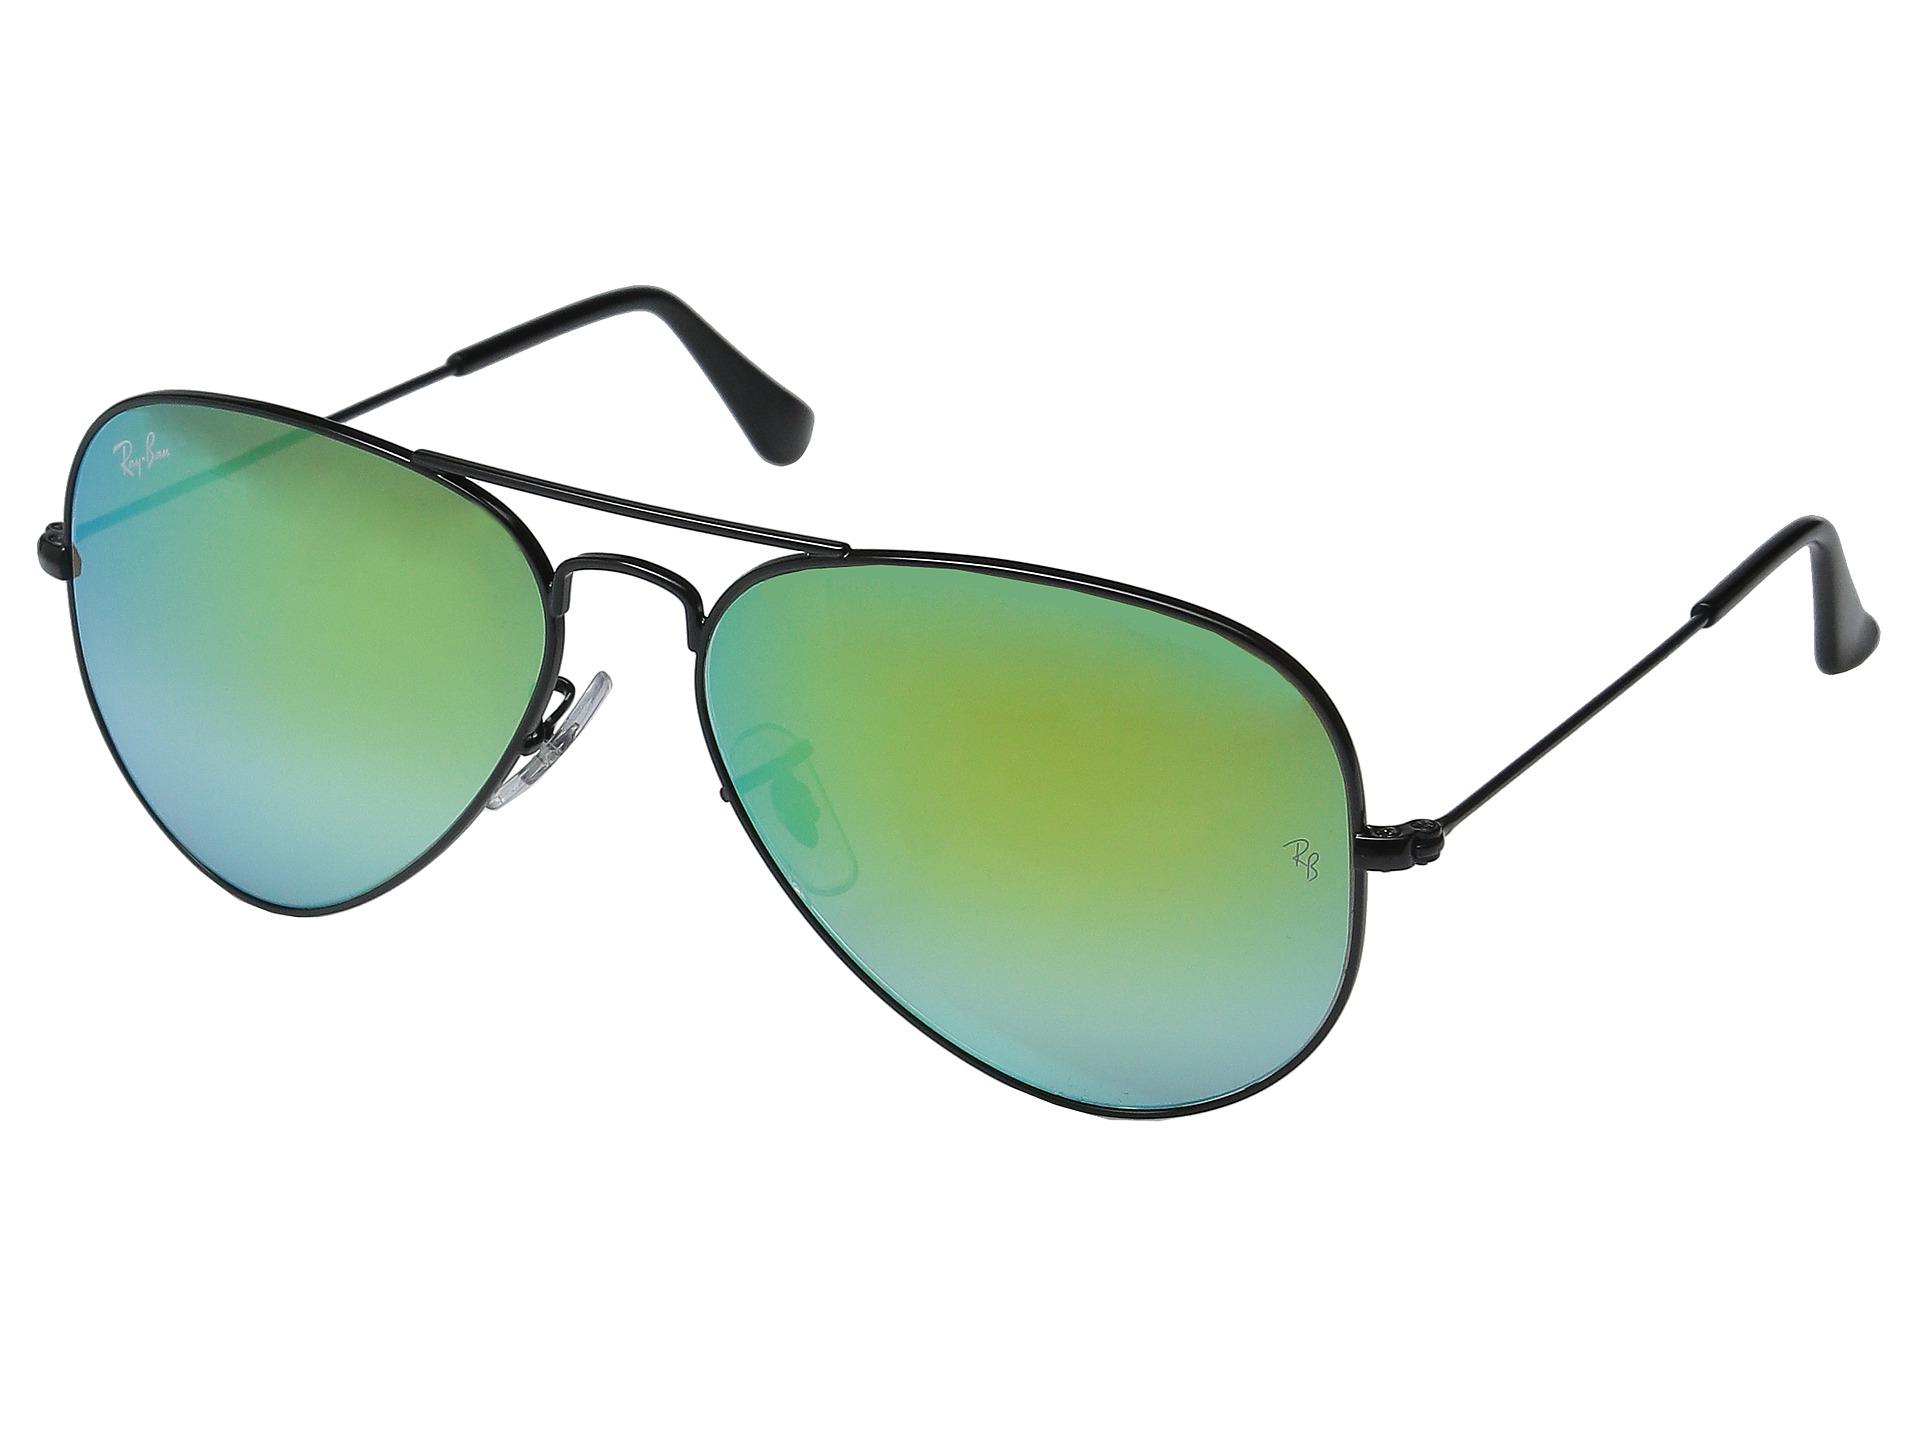 41e5ef419f5e Black And Pink Ray Ban Sunglasses Zappos